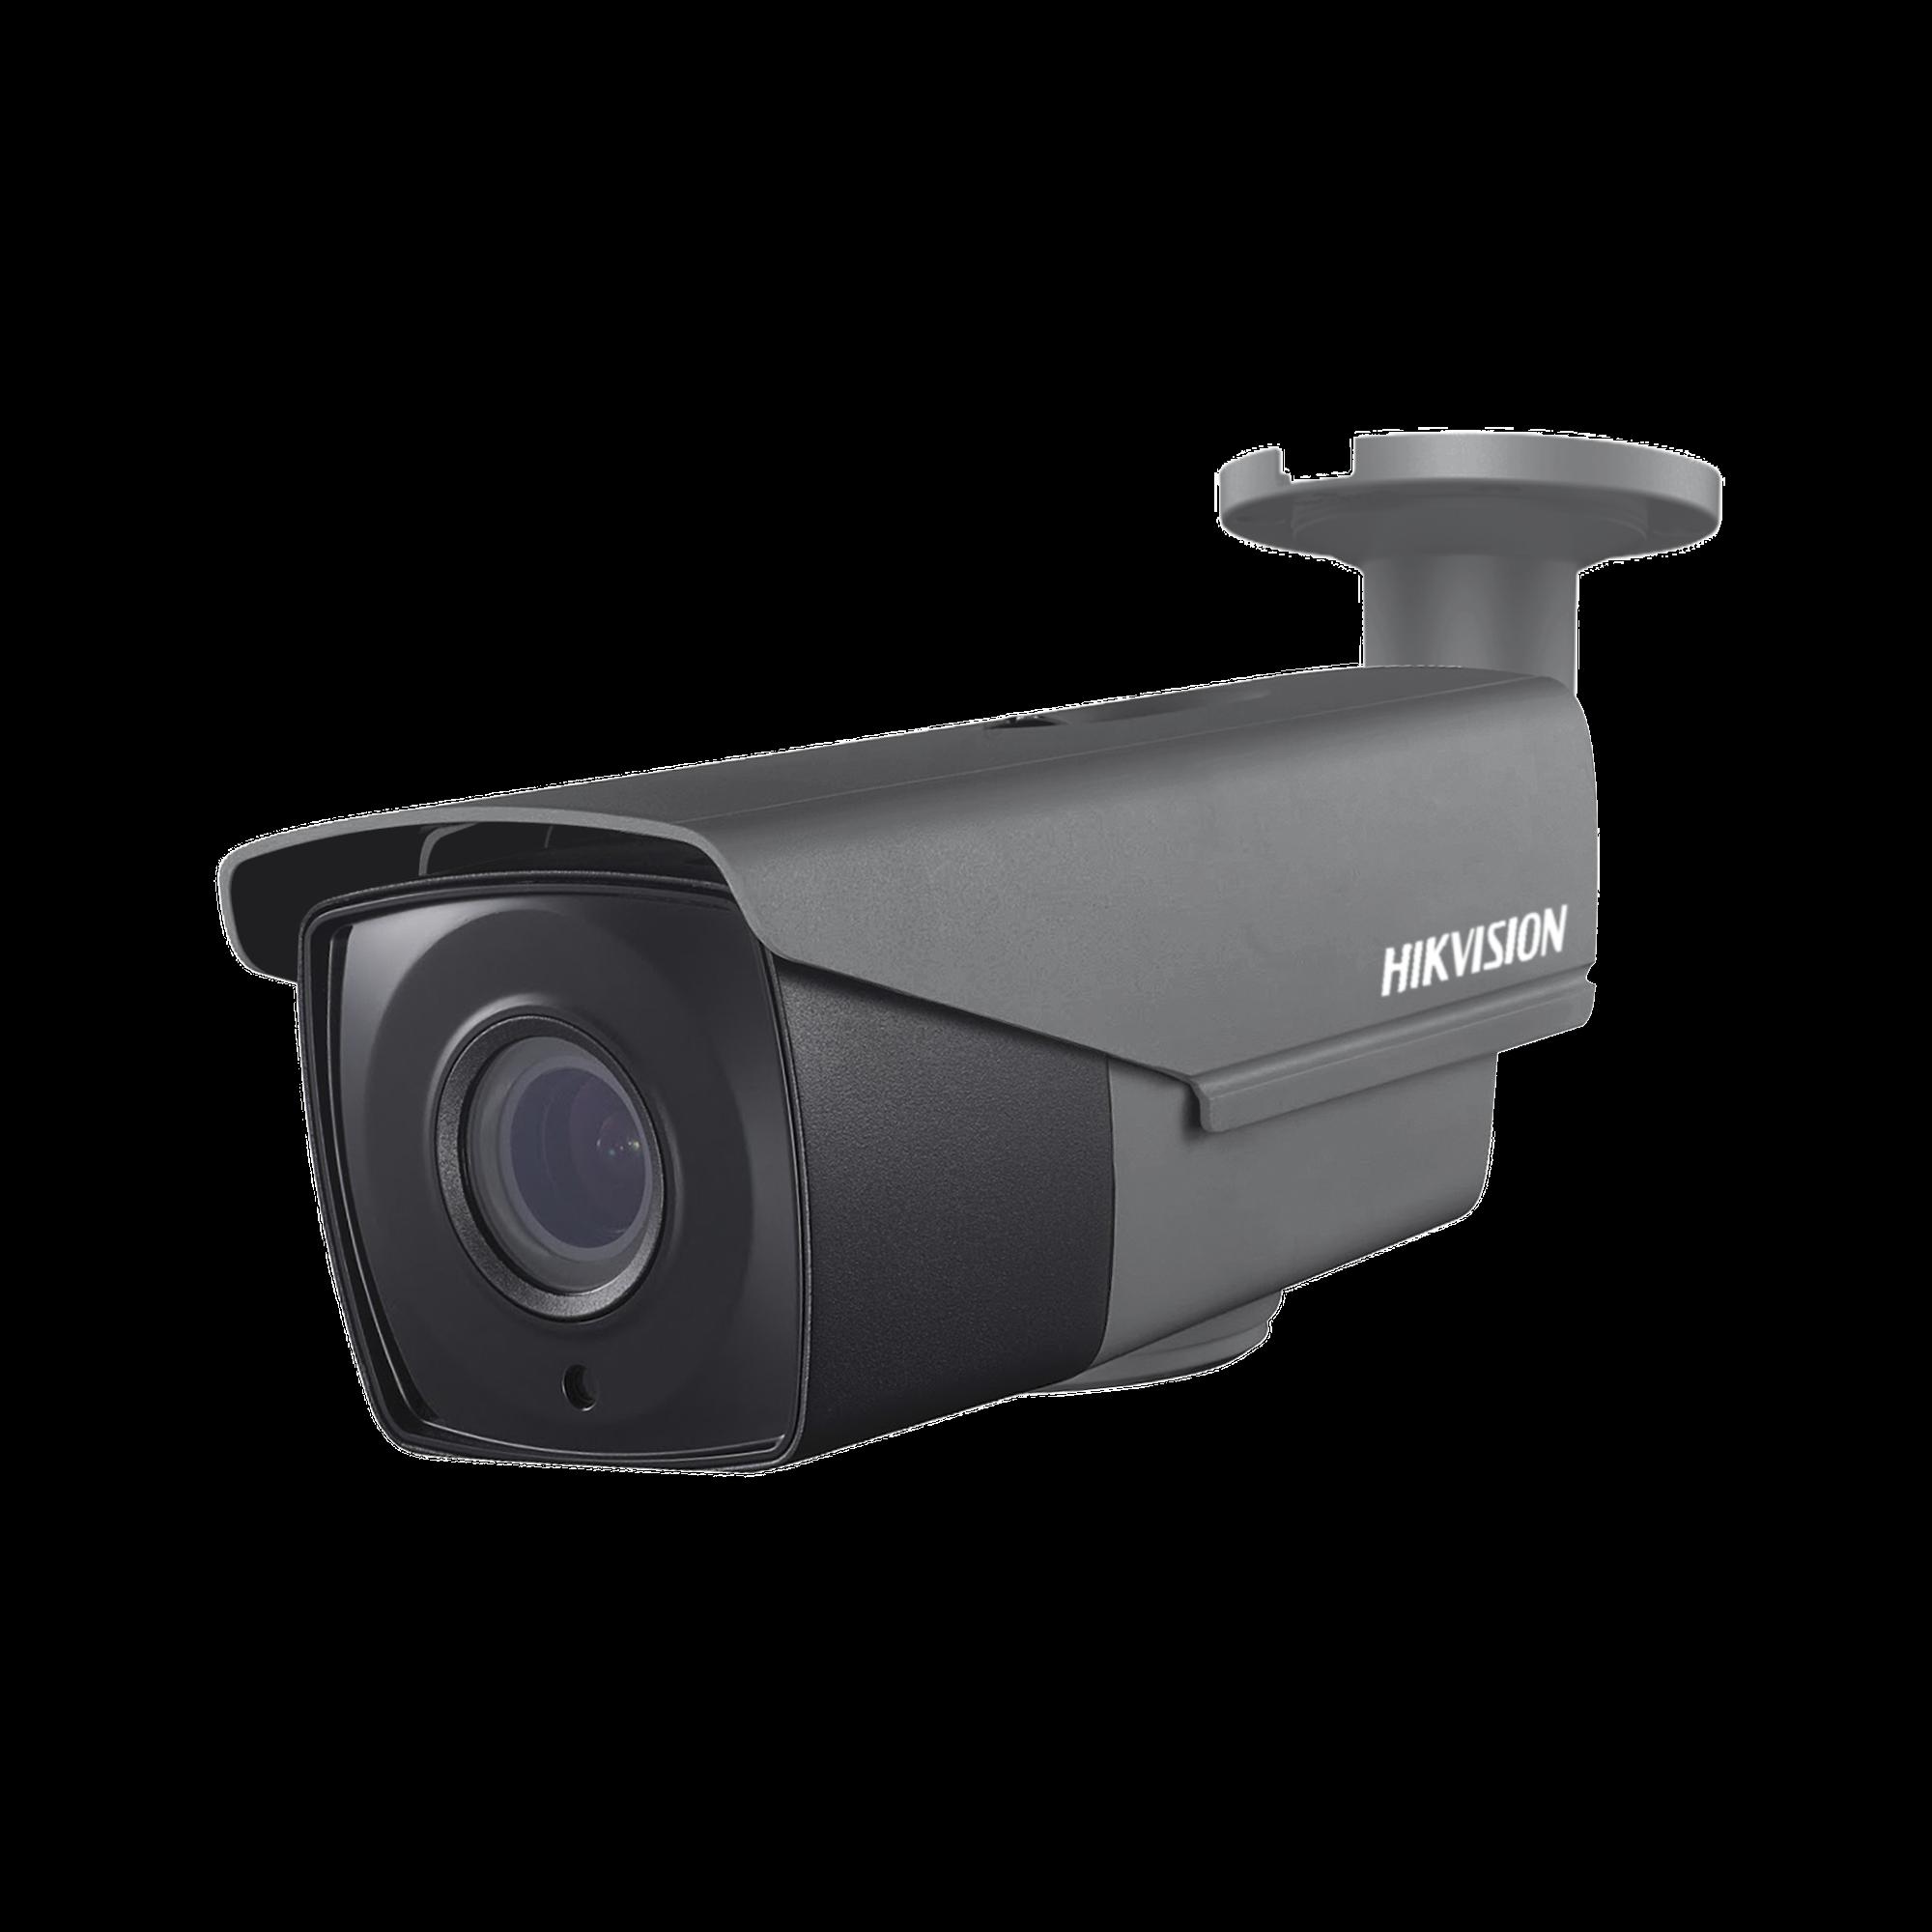 Bullet TURBO 1080p / Lente Mot. 2.8 a 12 mm / CLIMAS EXTREMOS / IR EXIR Inteligente 40 mts / Exterior IP66 / WDR Real 120 dB / Híbrida